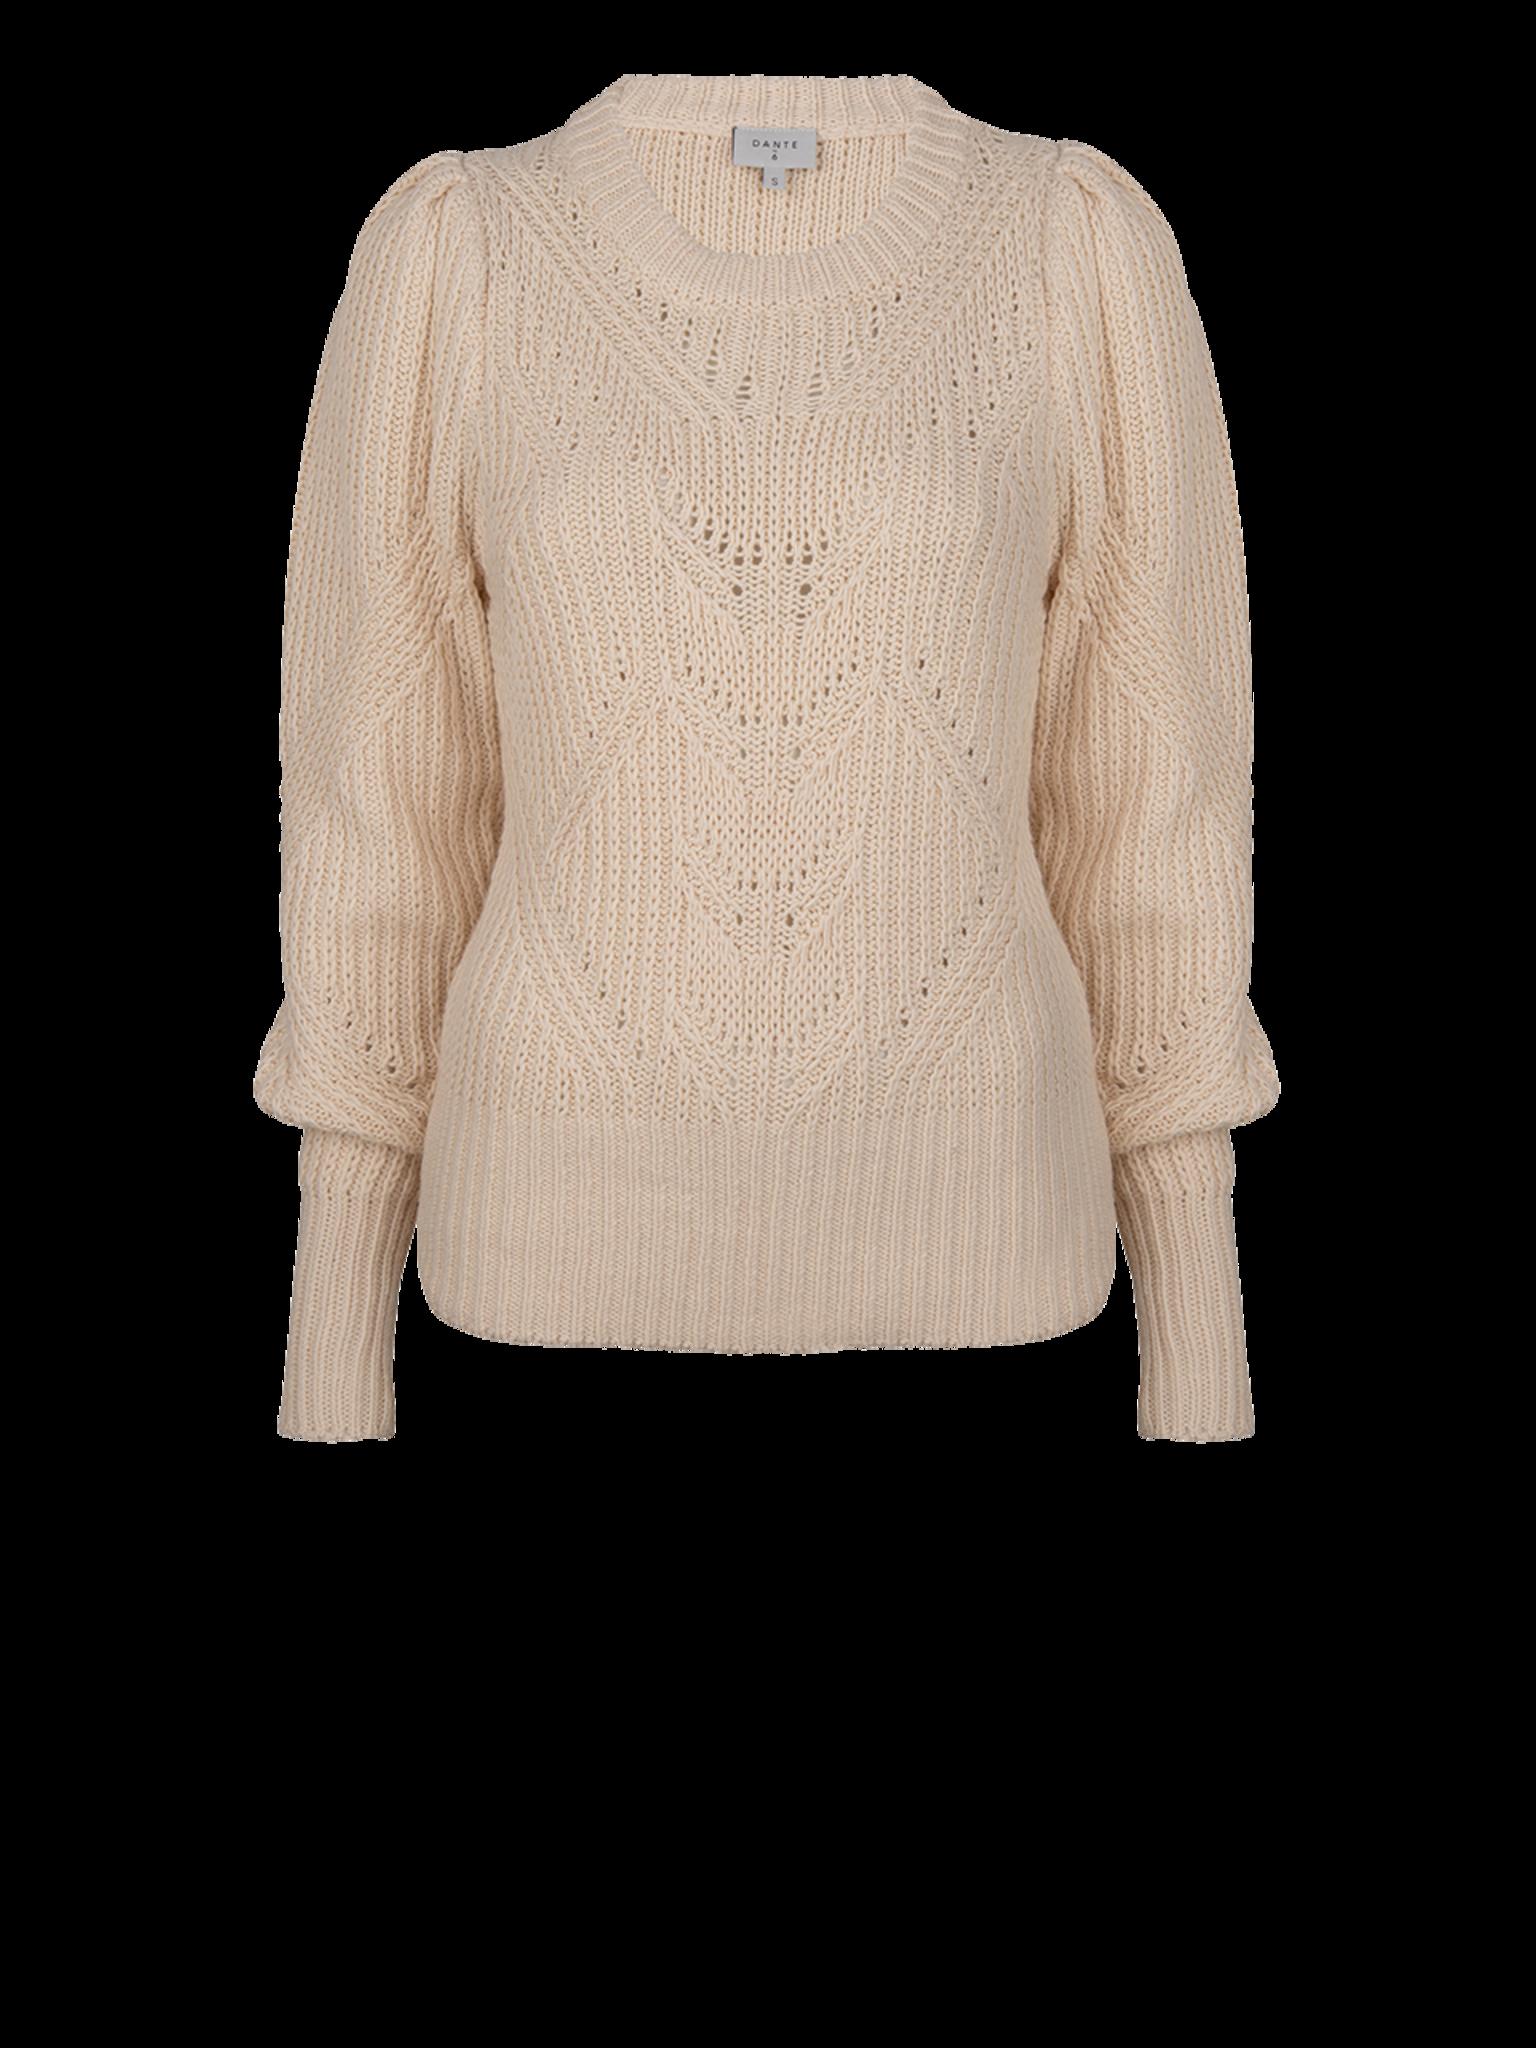 Dante 6 sweater 211402 CLEO-1